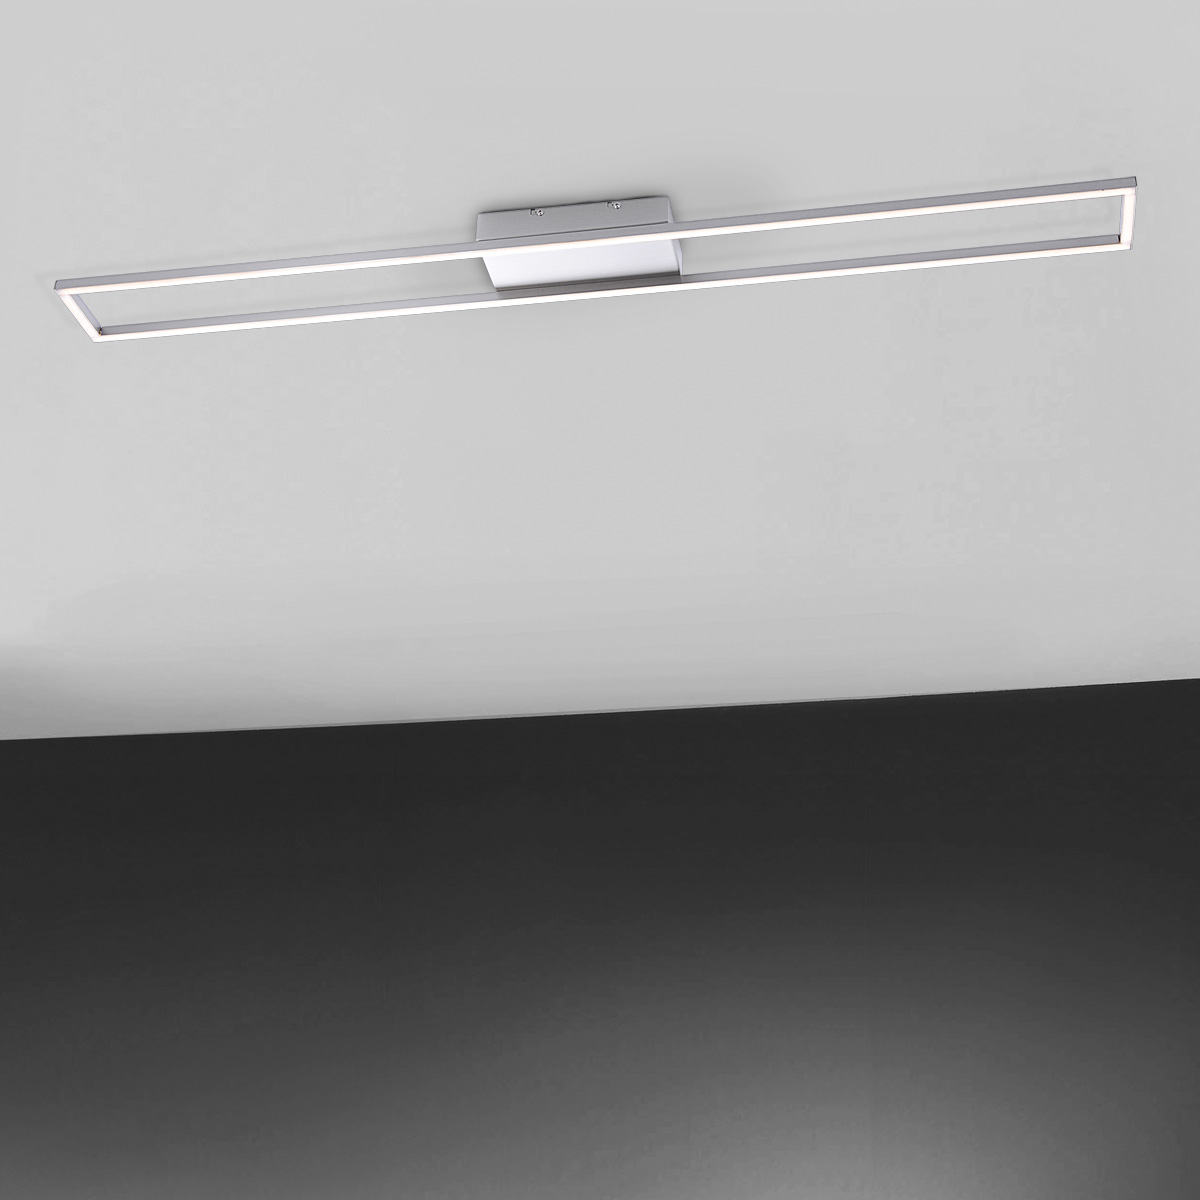 paul neuhaus inigo led deckenleuchte rechteckig 8085 55 inigo reuter onlineshop. Black Bedroom Furniture Sets. Home Design Ideas